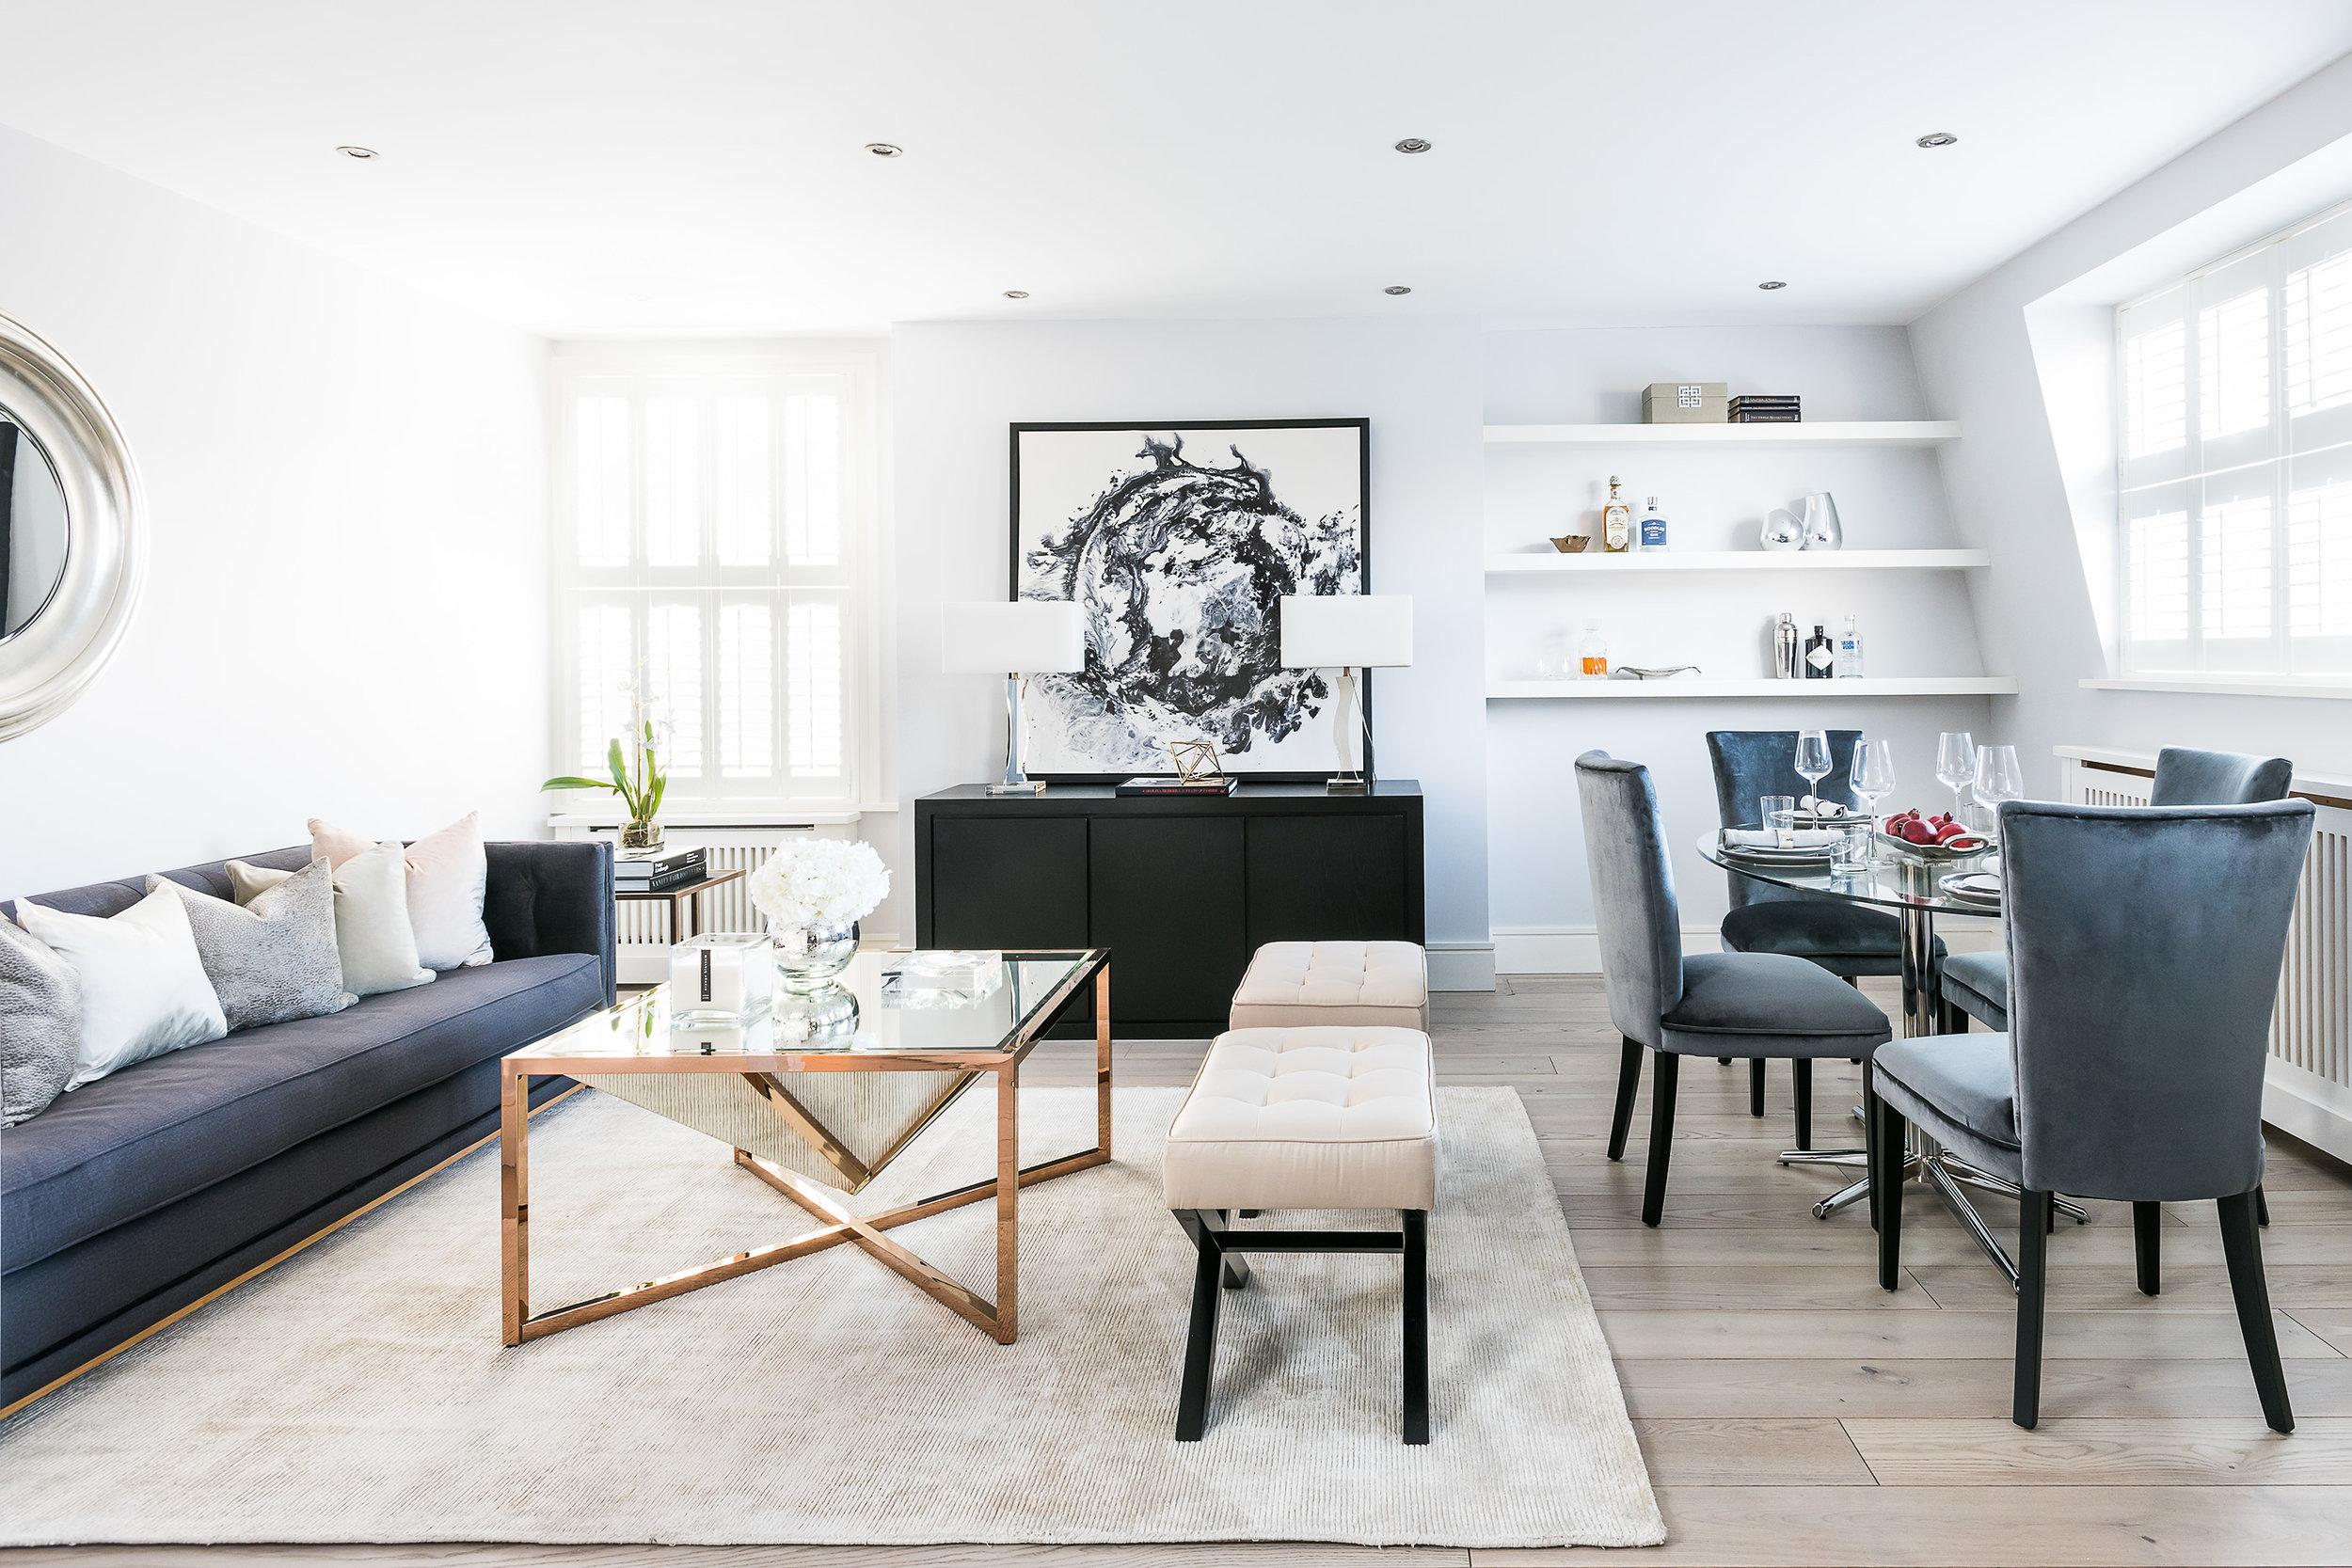 kensington-penthouse-1.jpg